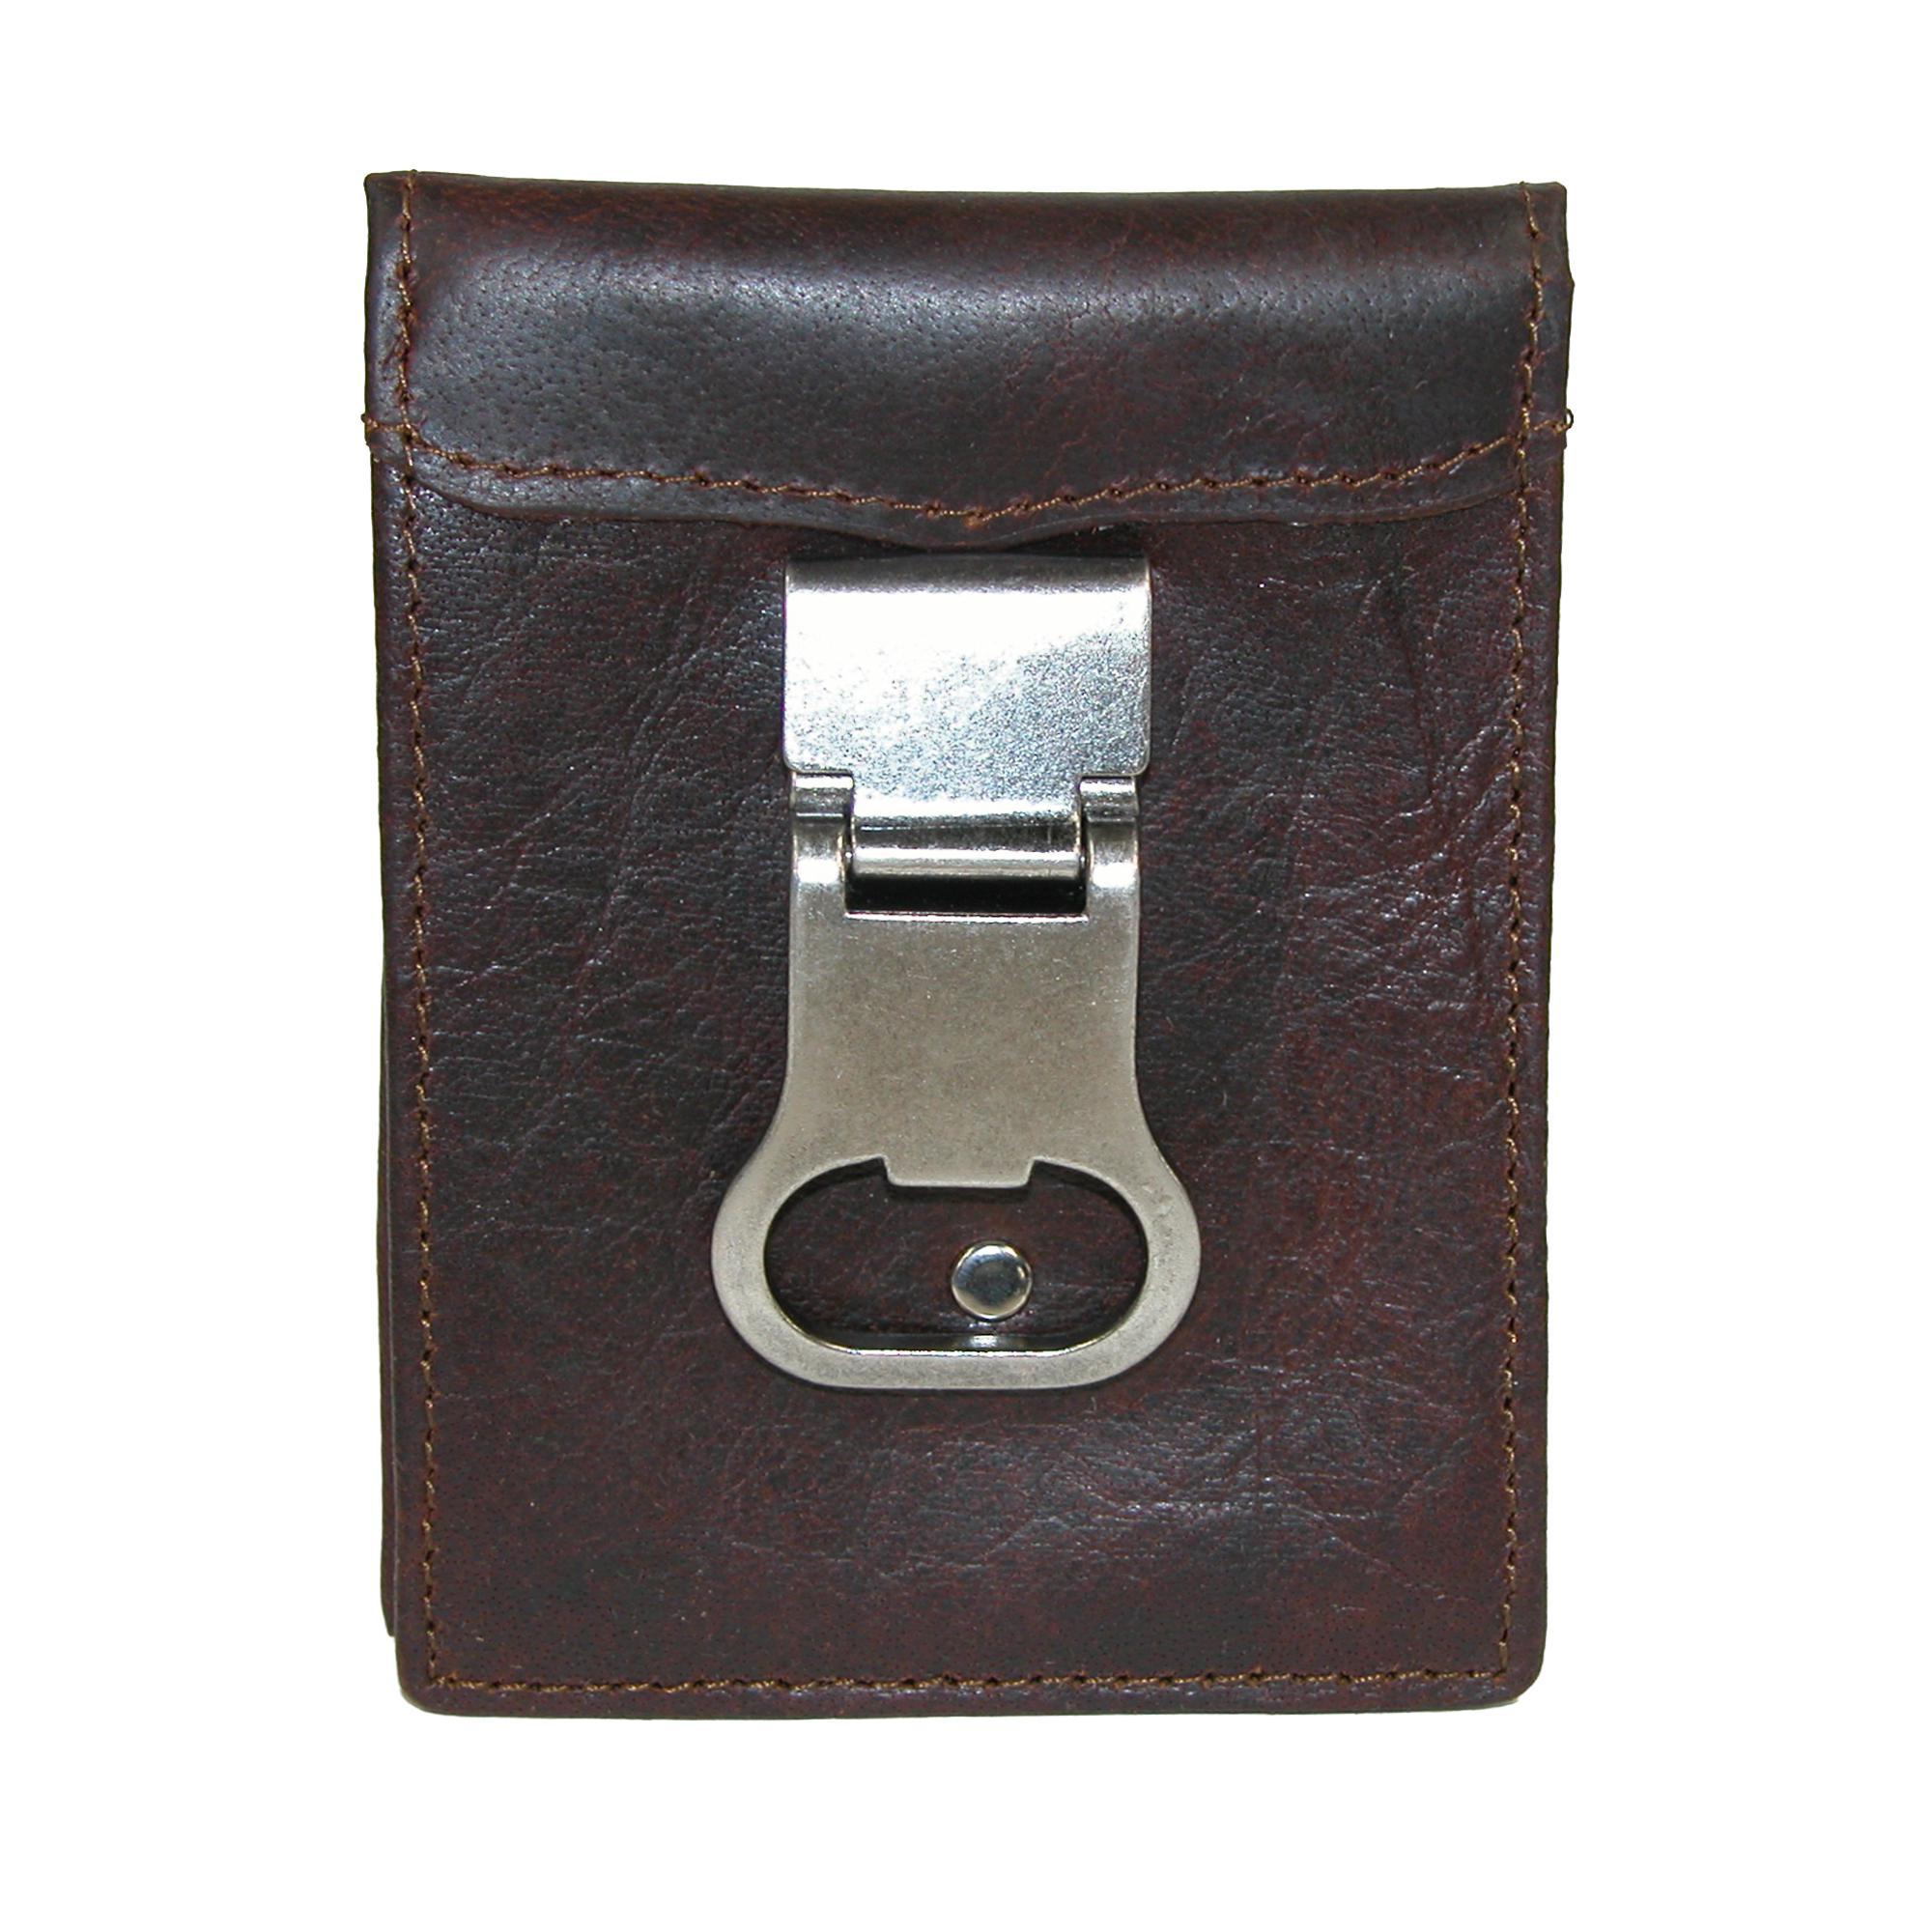 3 D Belt Company Men's Leather Basic Bifold Wallet With Bottle Opener Money Clip